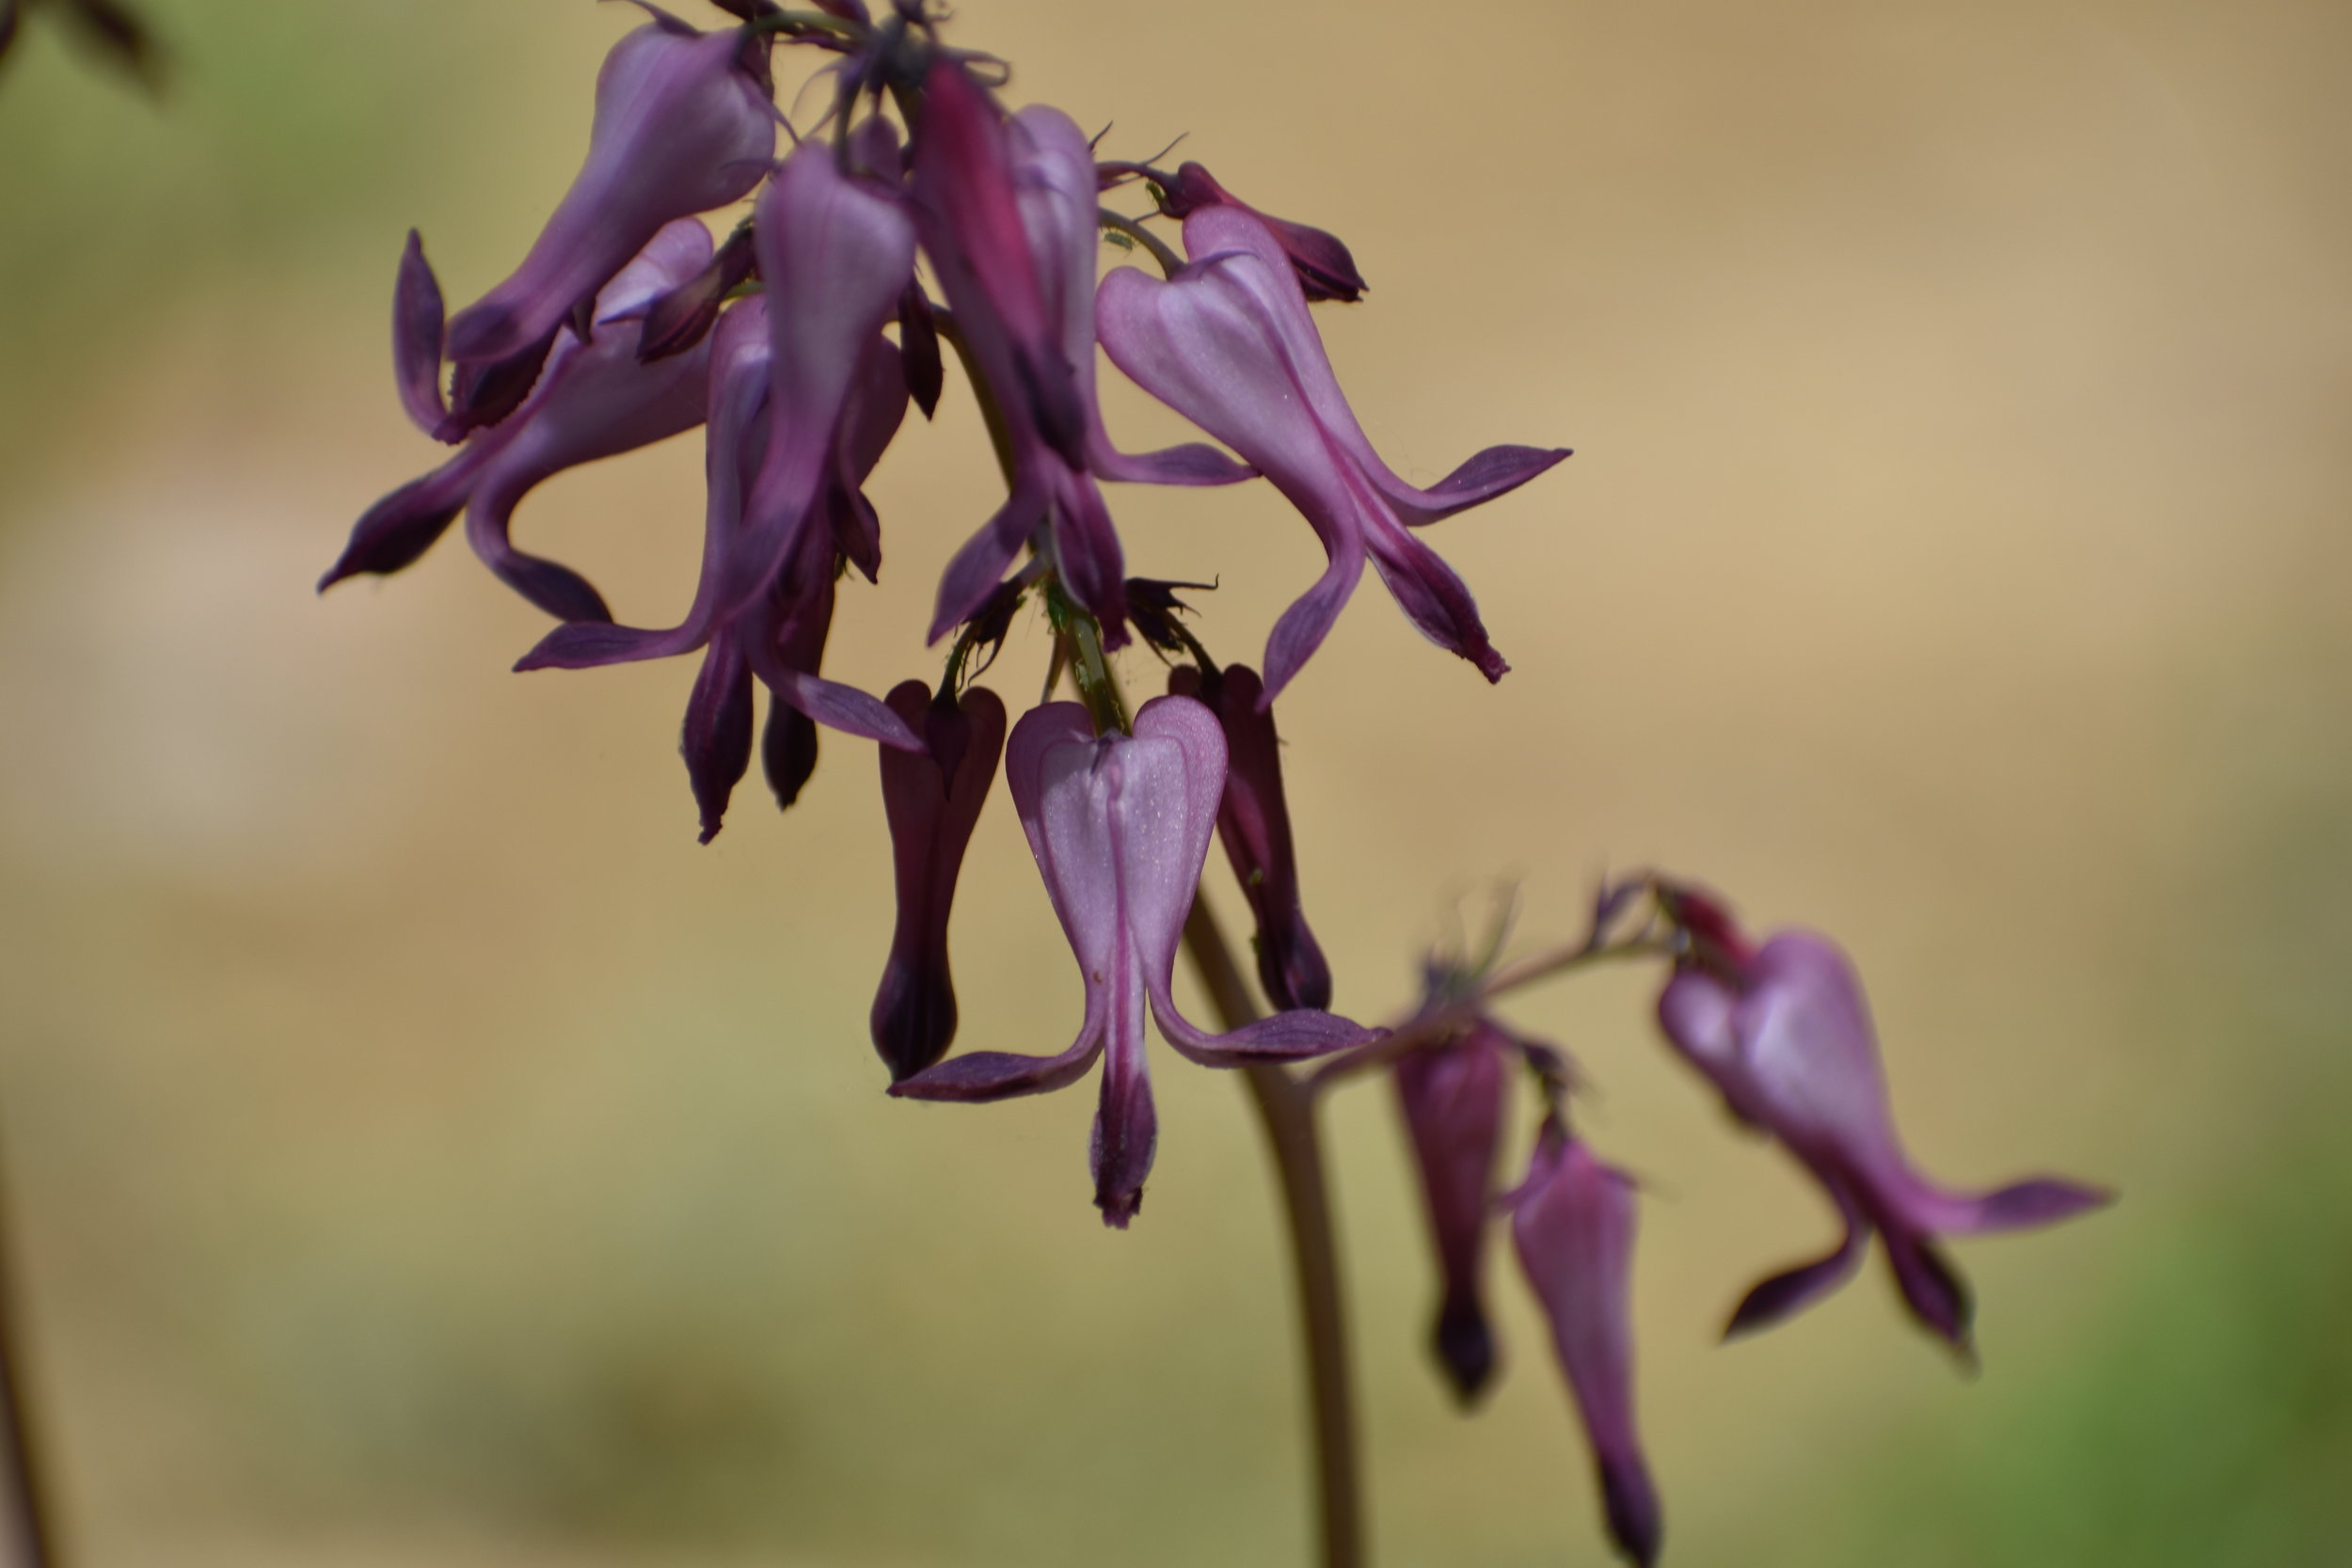 Wild Bleeding Heart is a flower that attracts hummingbirds